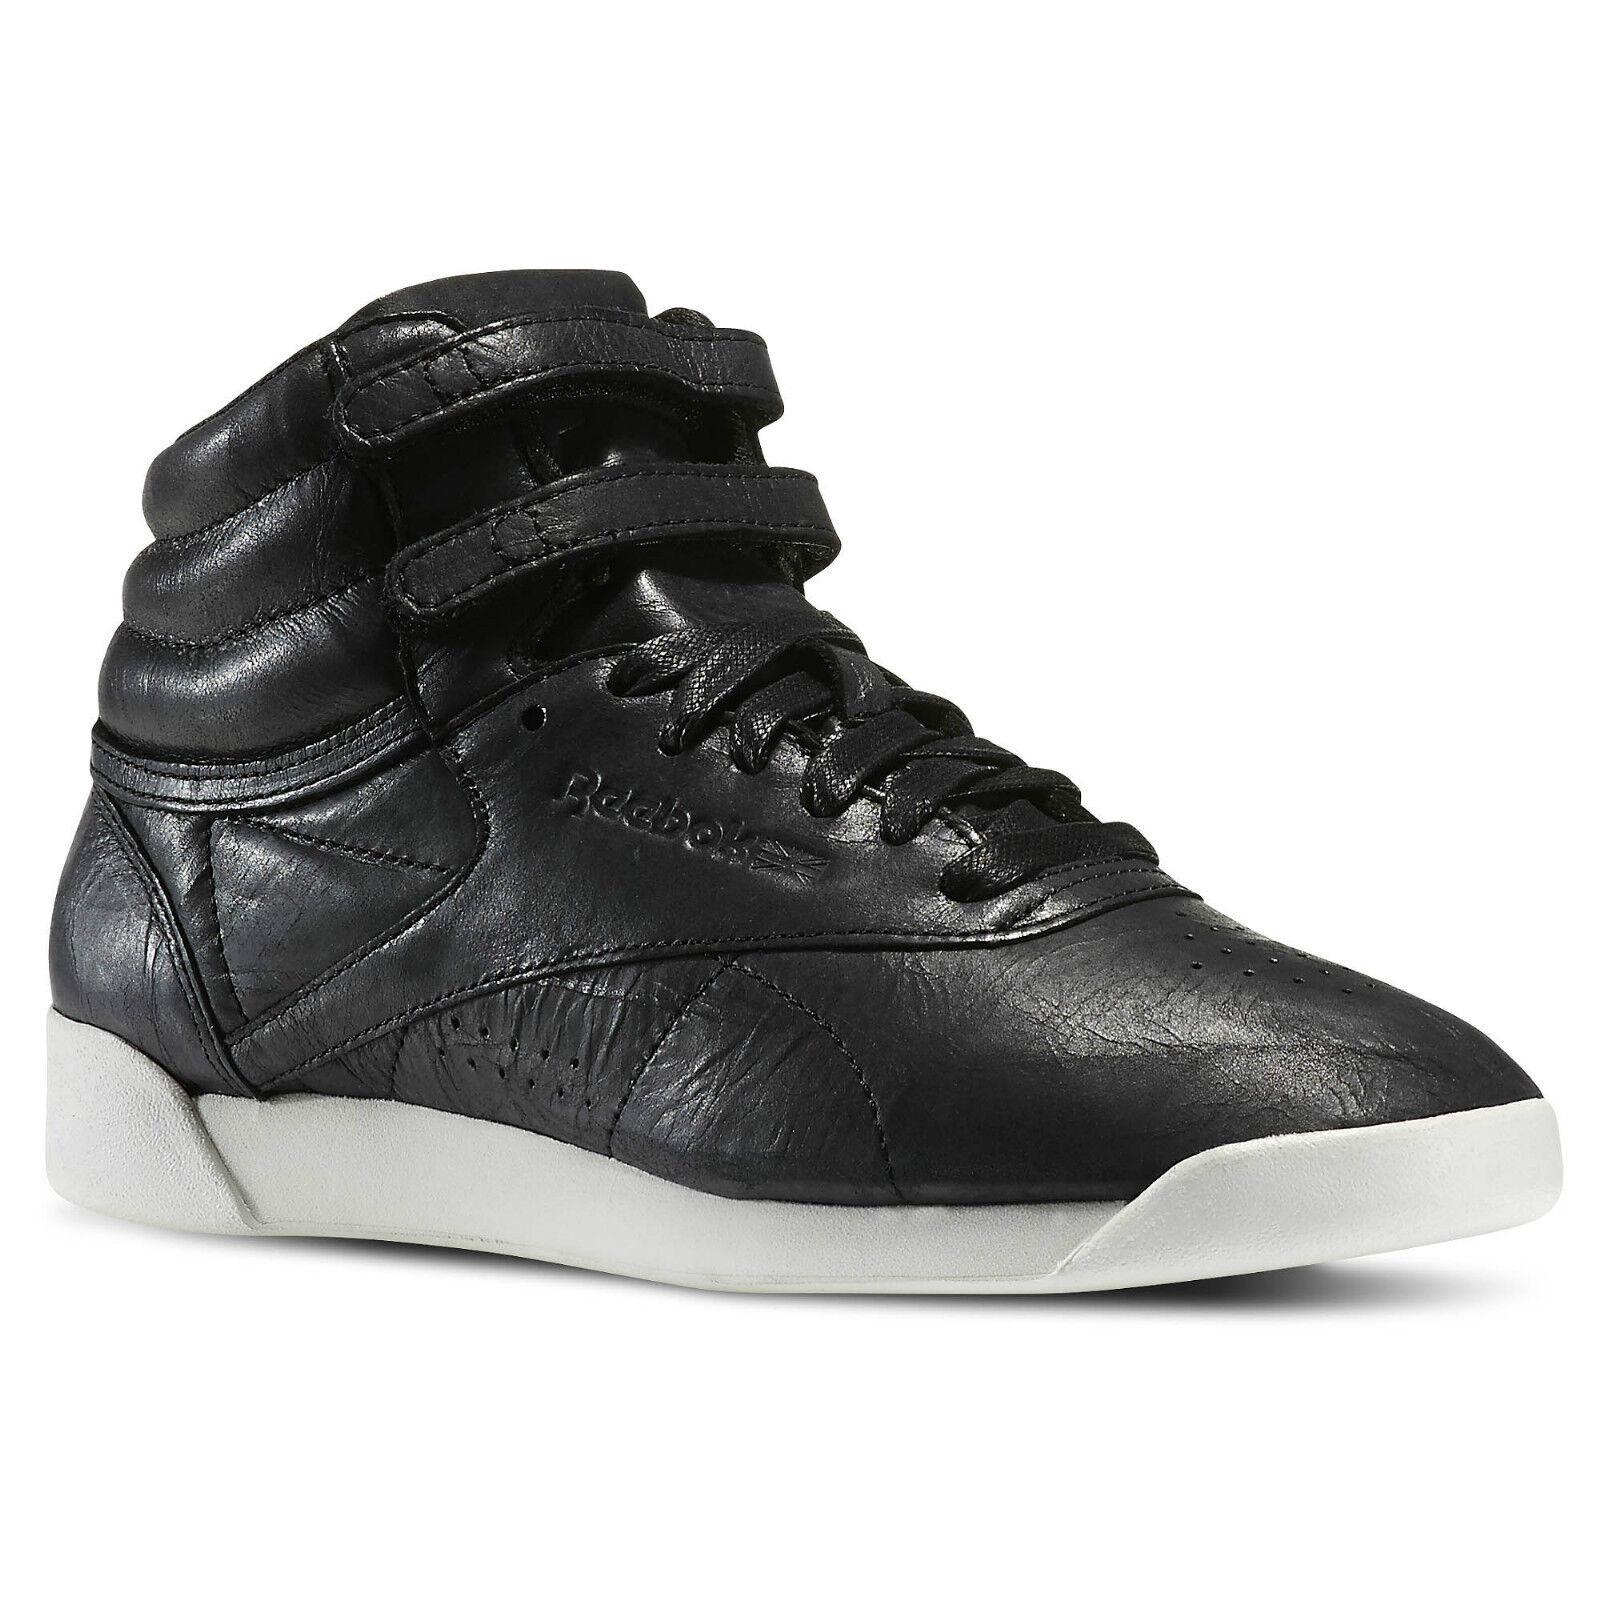 REEBOK F S HI PREMIUM LUX SHOE shoes BOTA black V62457 (PVP EN TIENDA 89EUR)